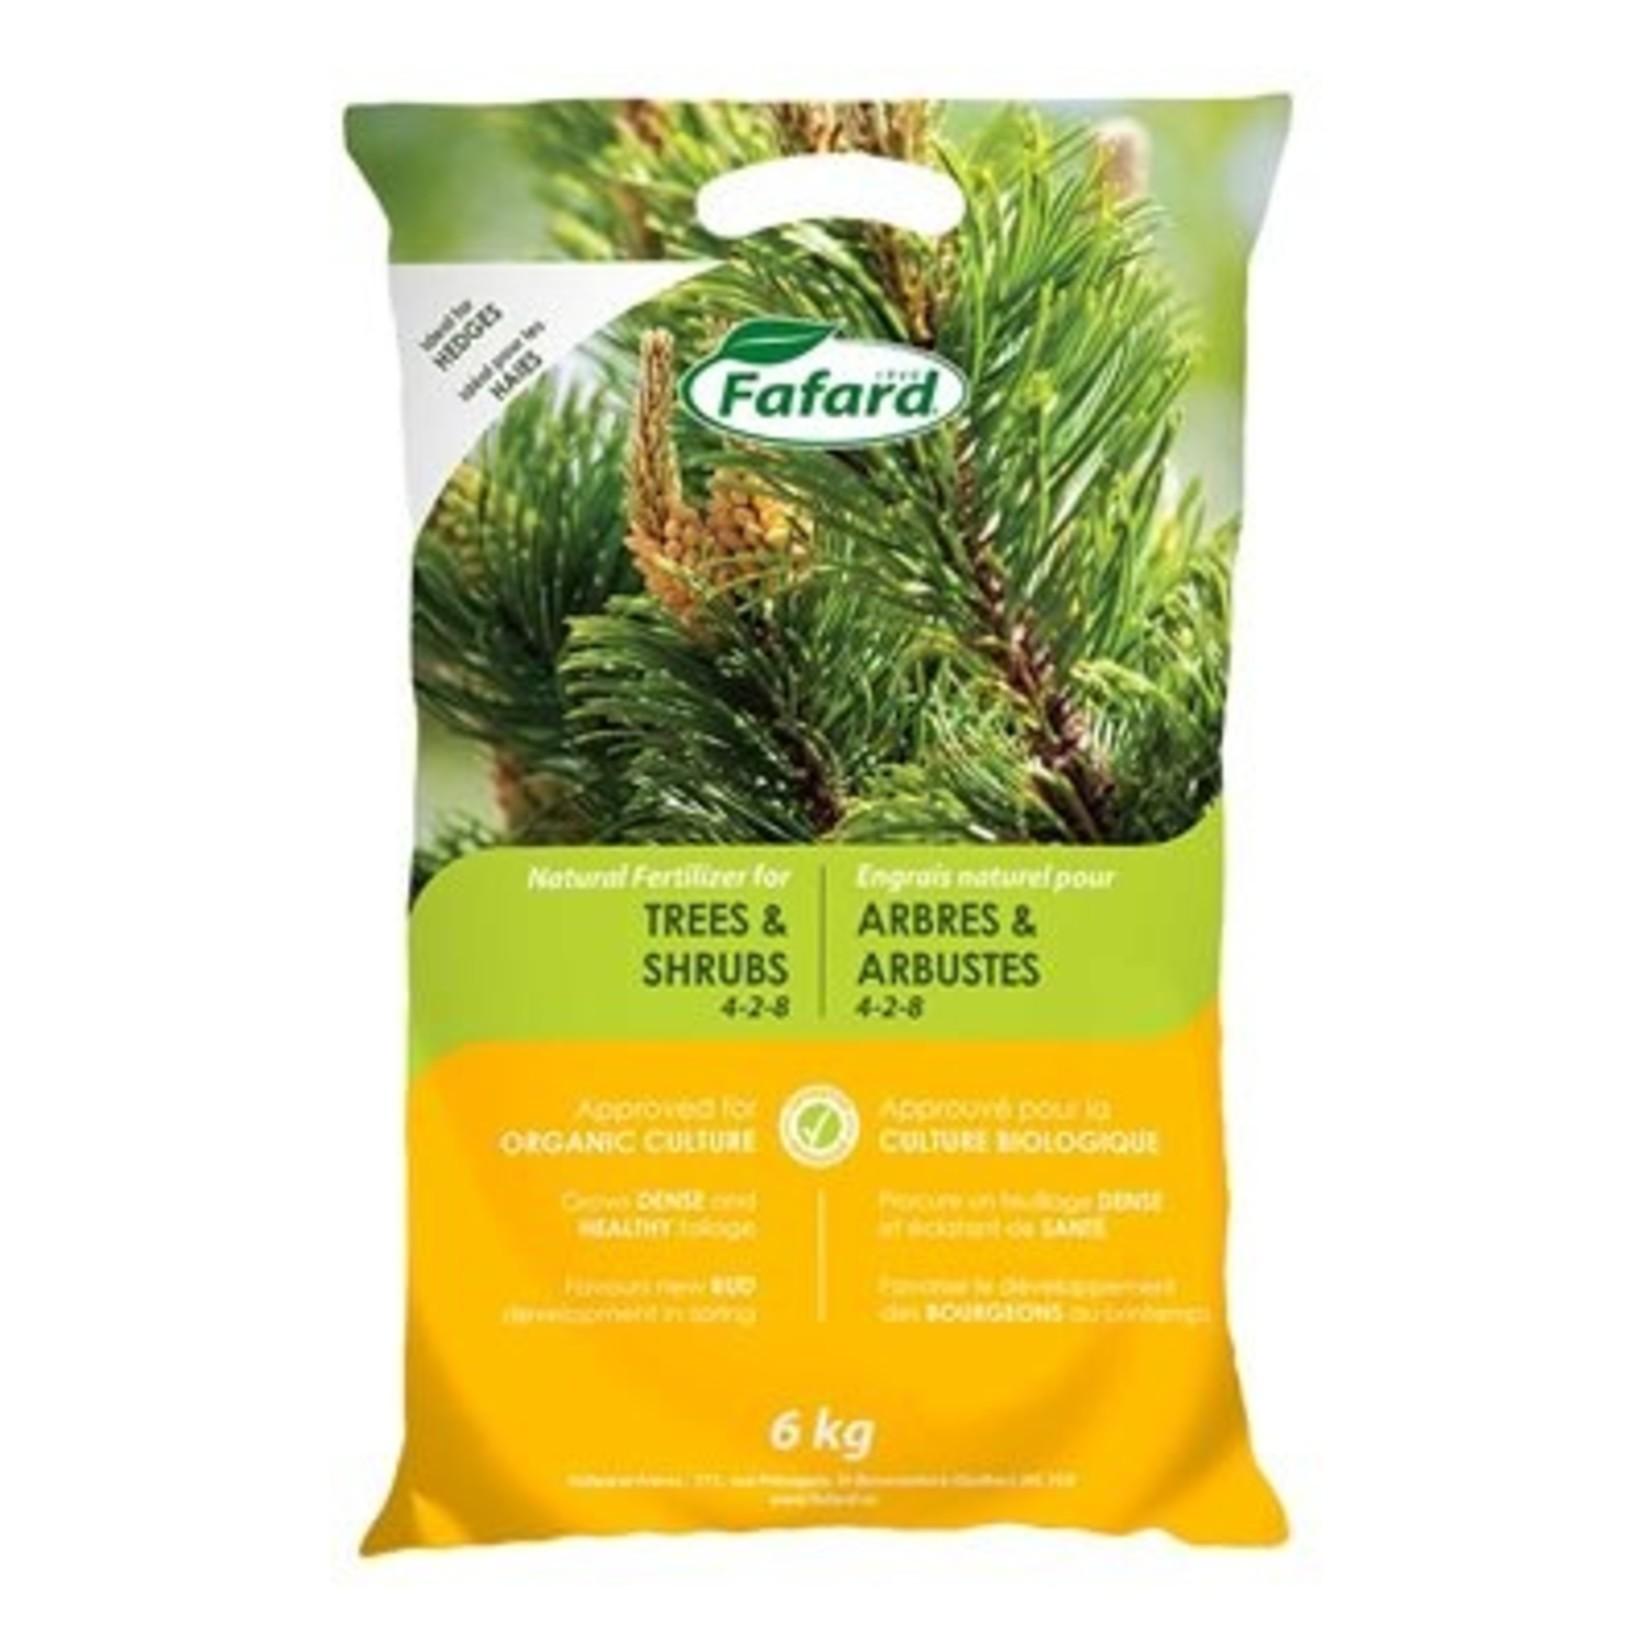 Fafard Natural Fertilizer for Trees & Shrubs (4-2-8) 6 KG